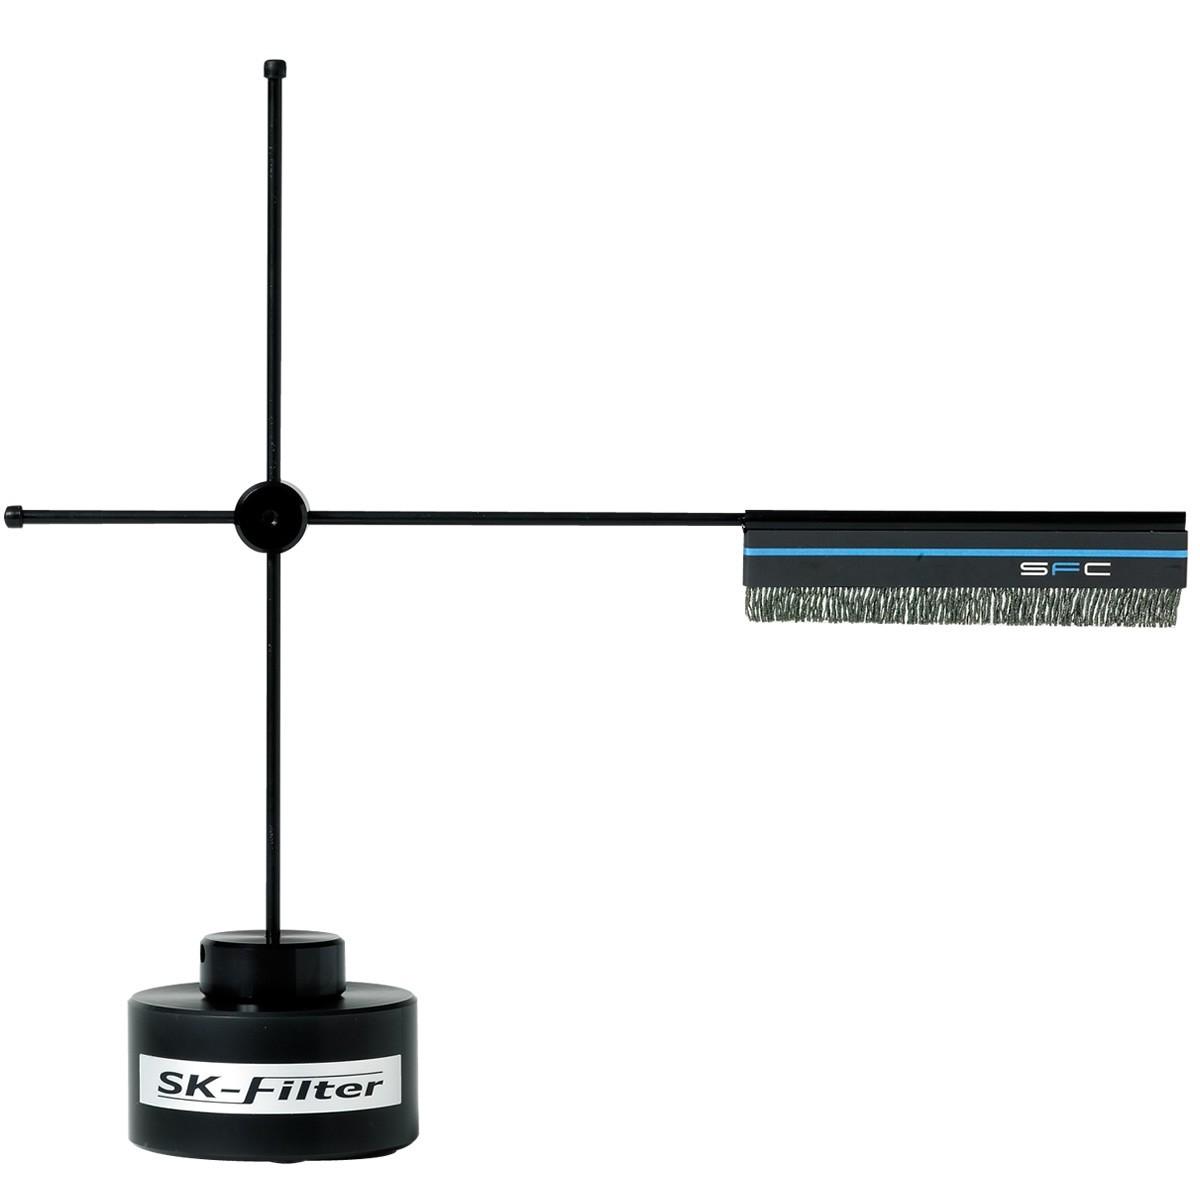 FURUTECH SK-Filter Turntable LP Static Eliminator